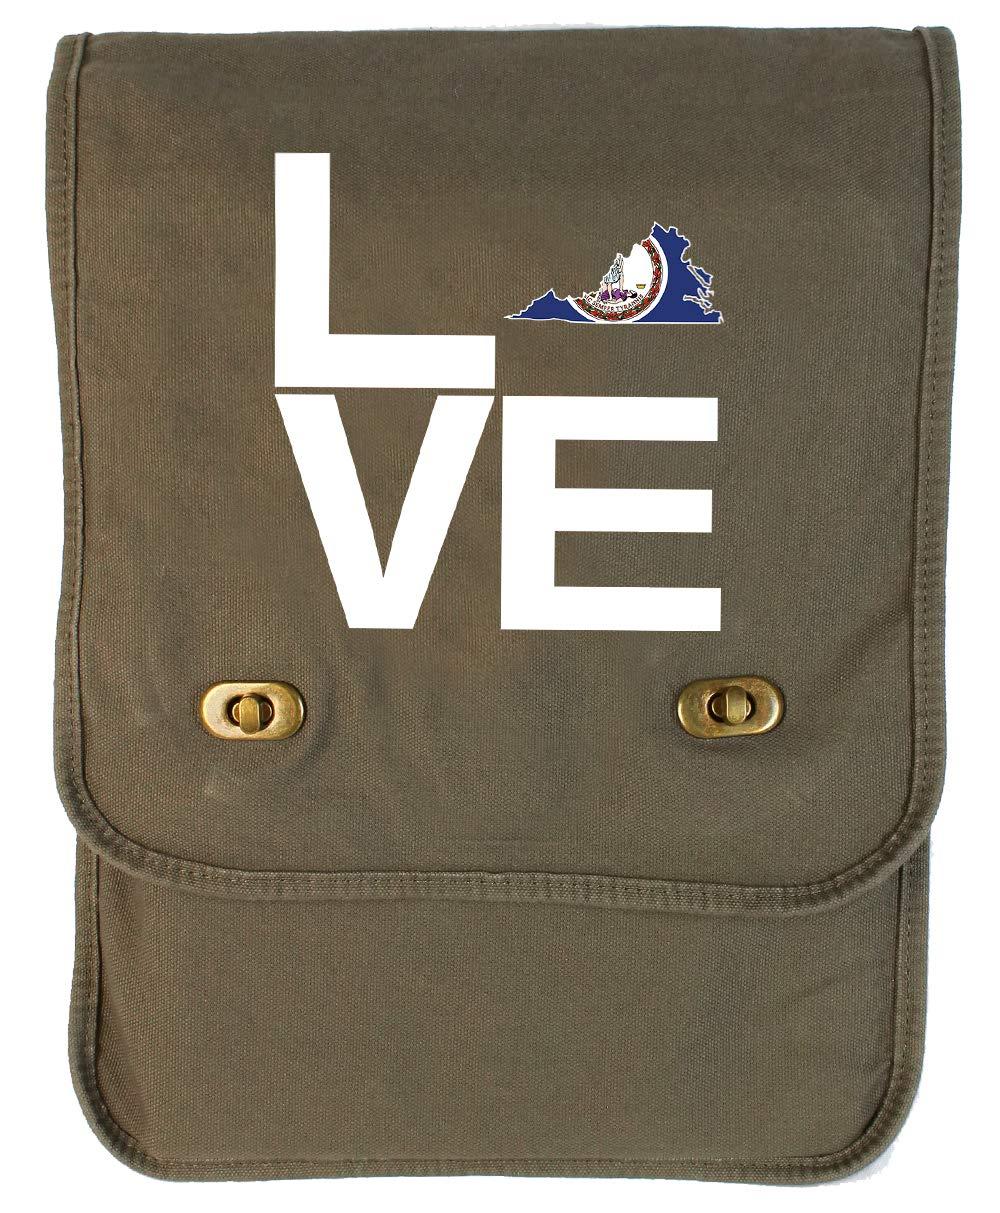 Tenacitee LOVE Virginia Maroon Brushed Canvas Messenger Bag